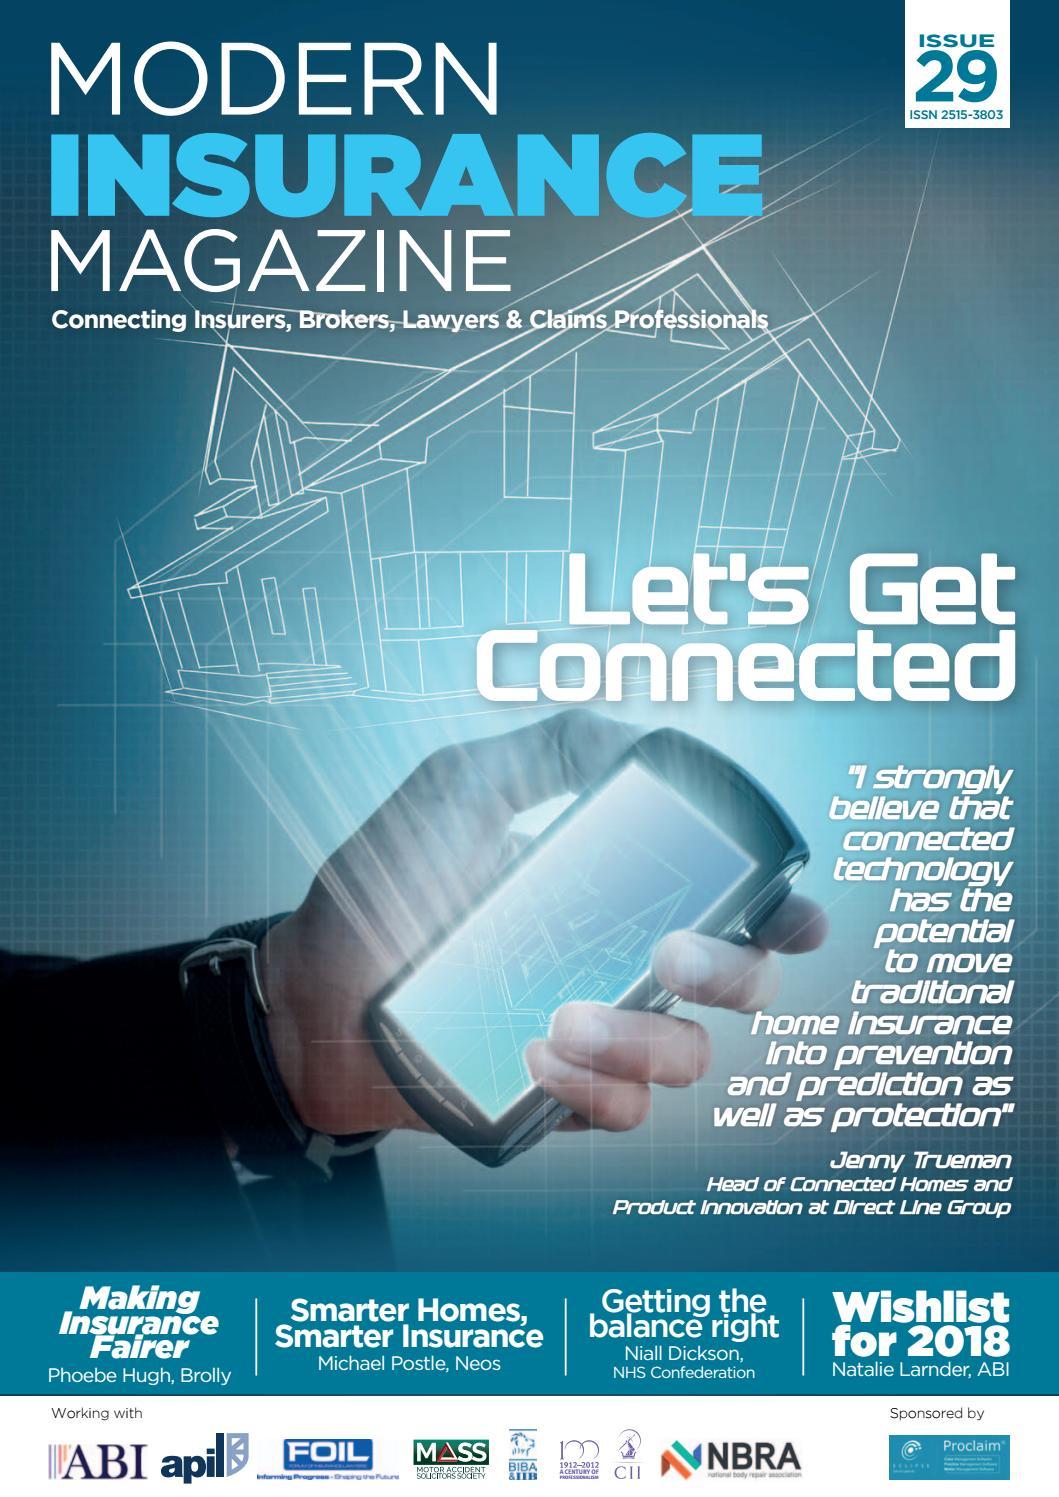 Modern Insurance Magazine Issue 29 by Charlton Grant - Issuu